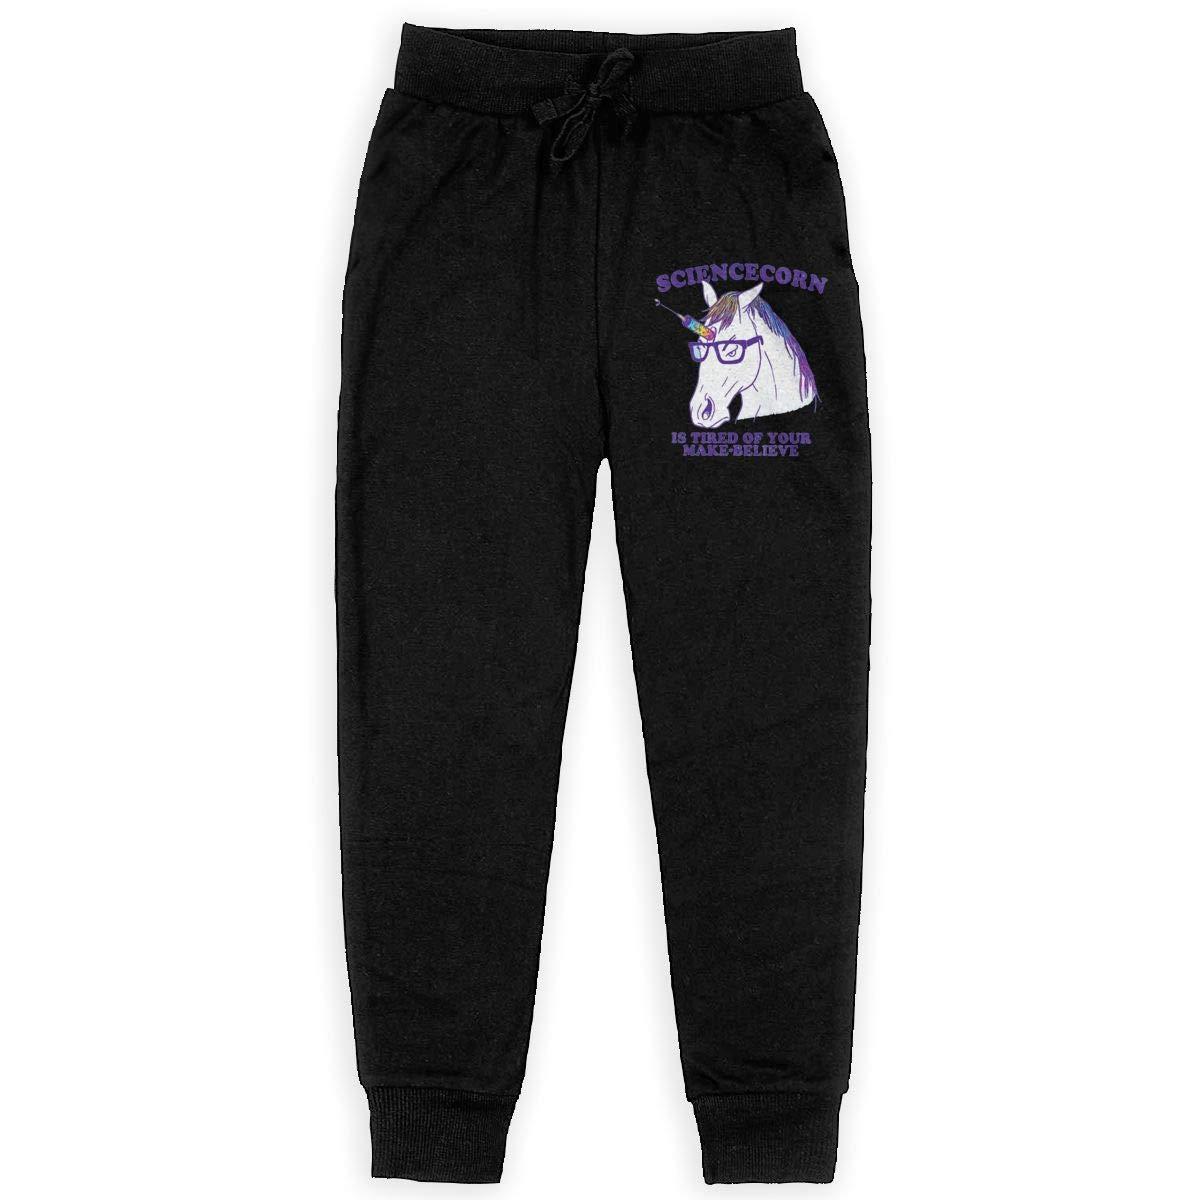 Dunpaiaa Sciencecorn Boys Sweatpants,Joggers Sport Training Pants Trousers Black